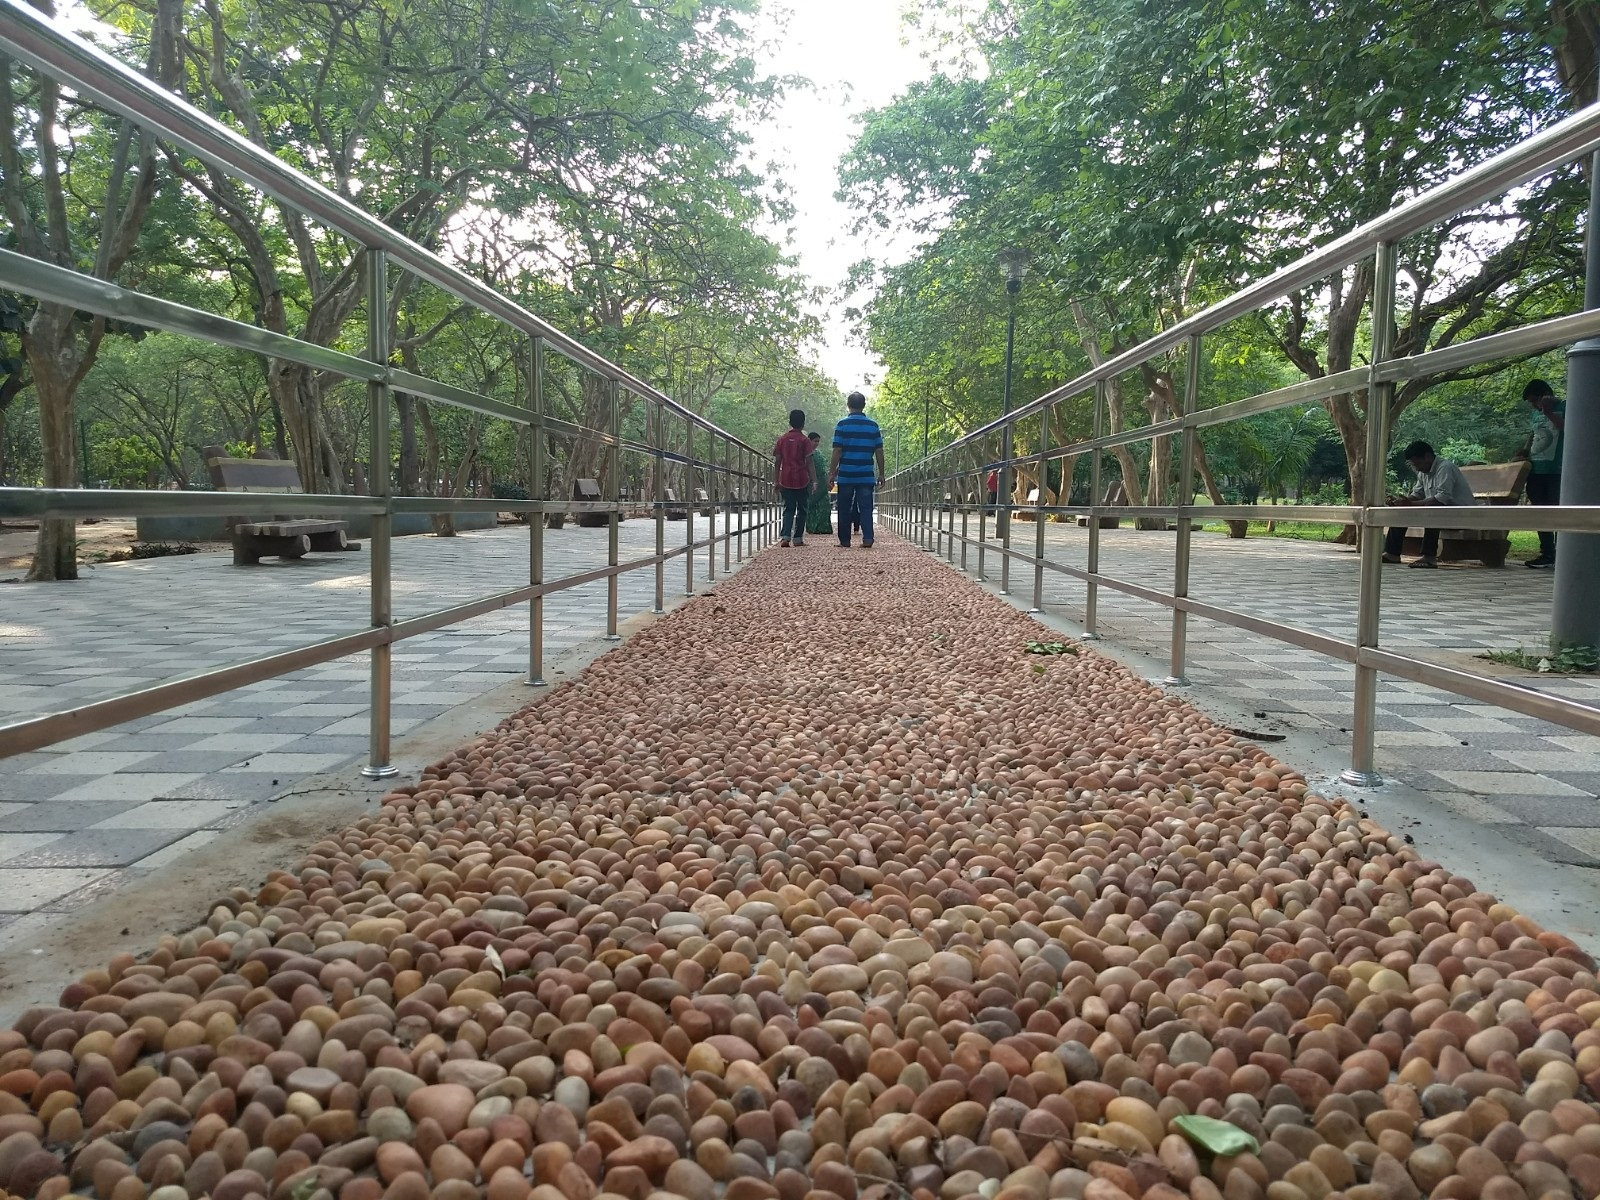 acupressure walkway, After Bhubaneswar, Now Rourkela To Get It's First 'Acupressure Walkway' Very Soon!